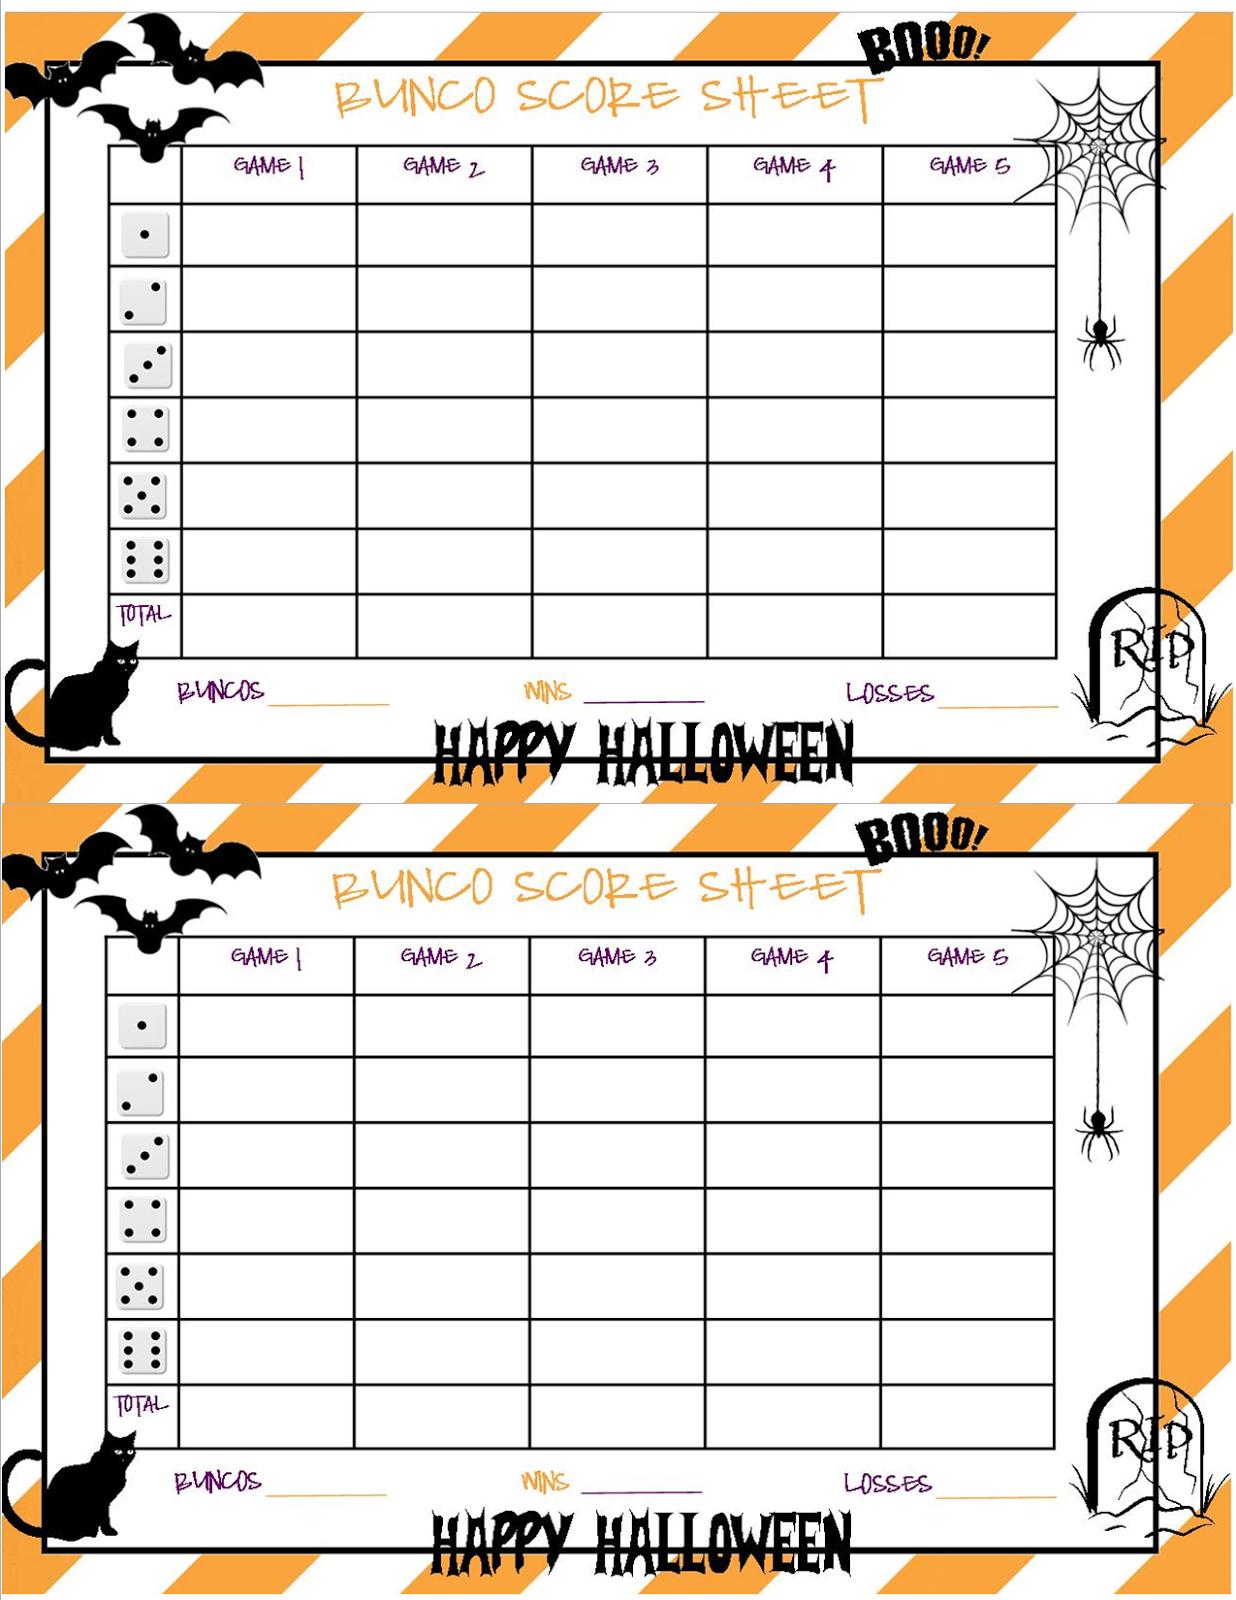 Recipes From Stephanie: Halloween Bunco Sheet | Halloween - Free Printable Halloween Bunco Score Sheets